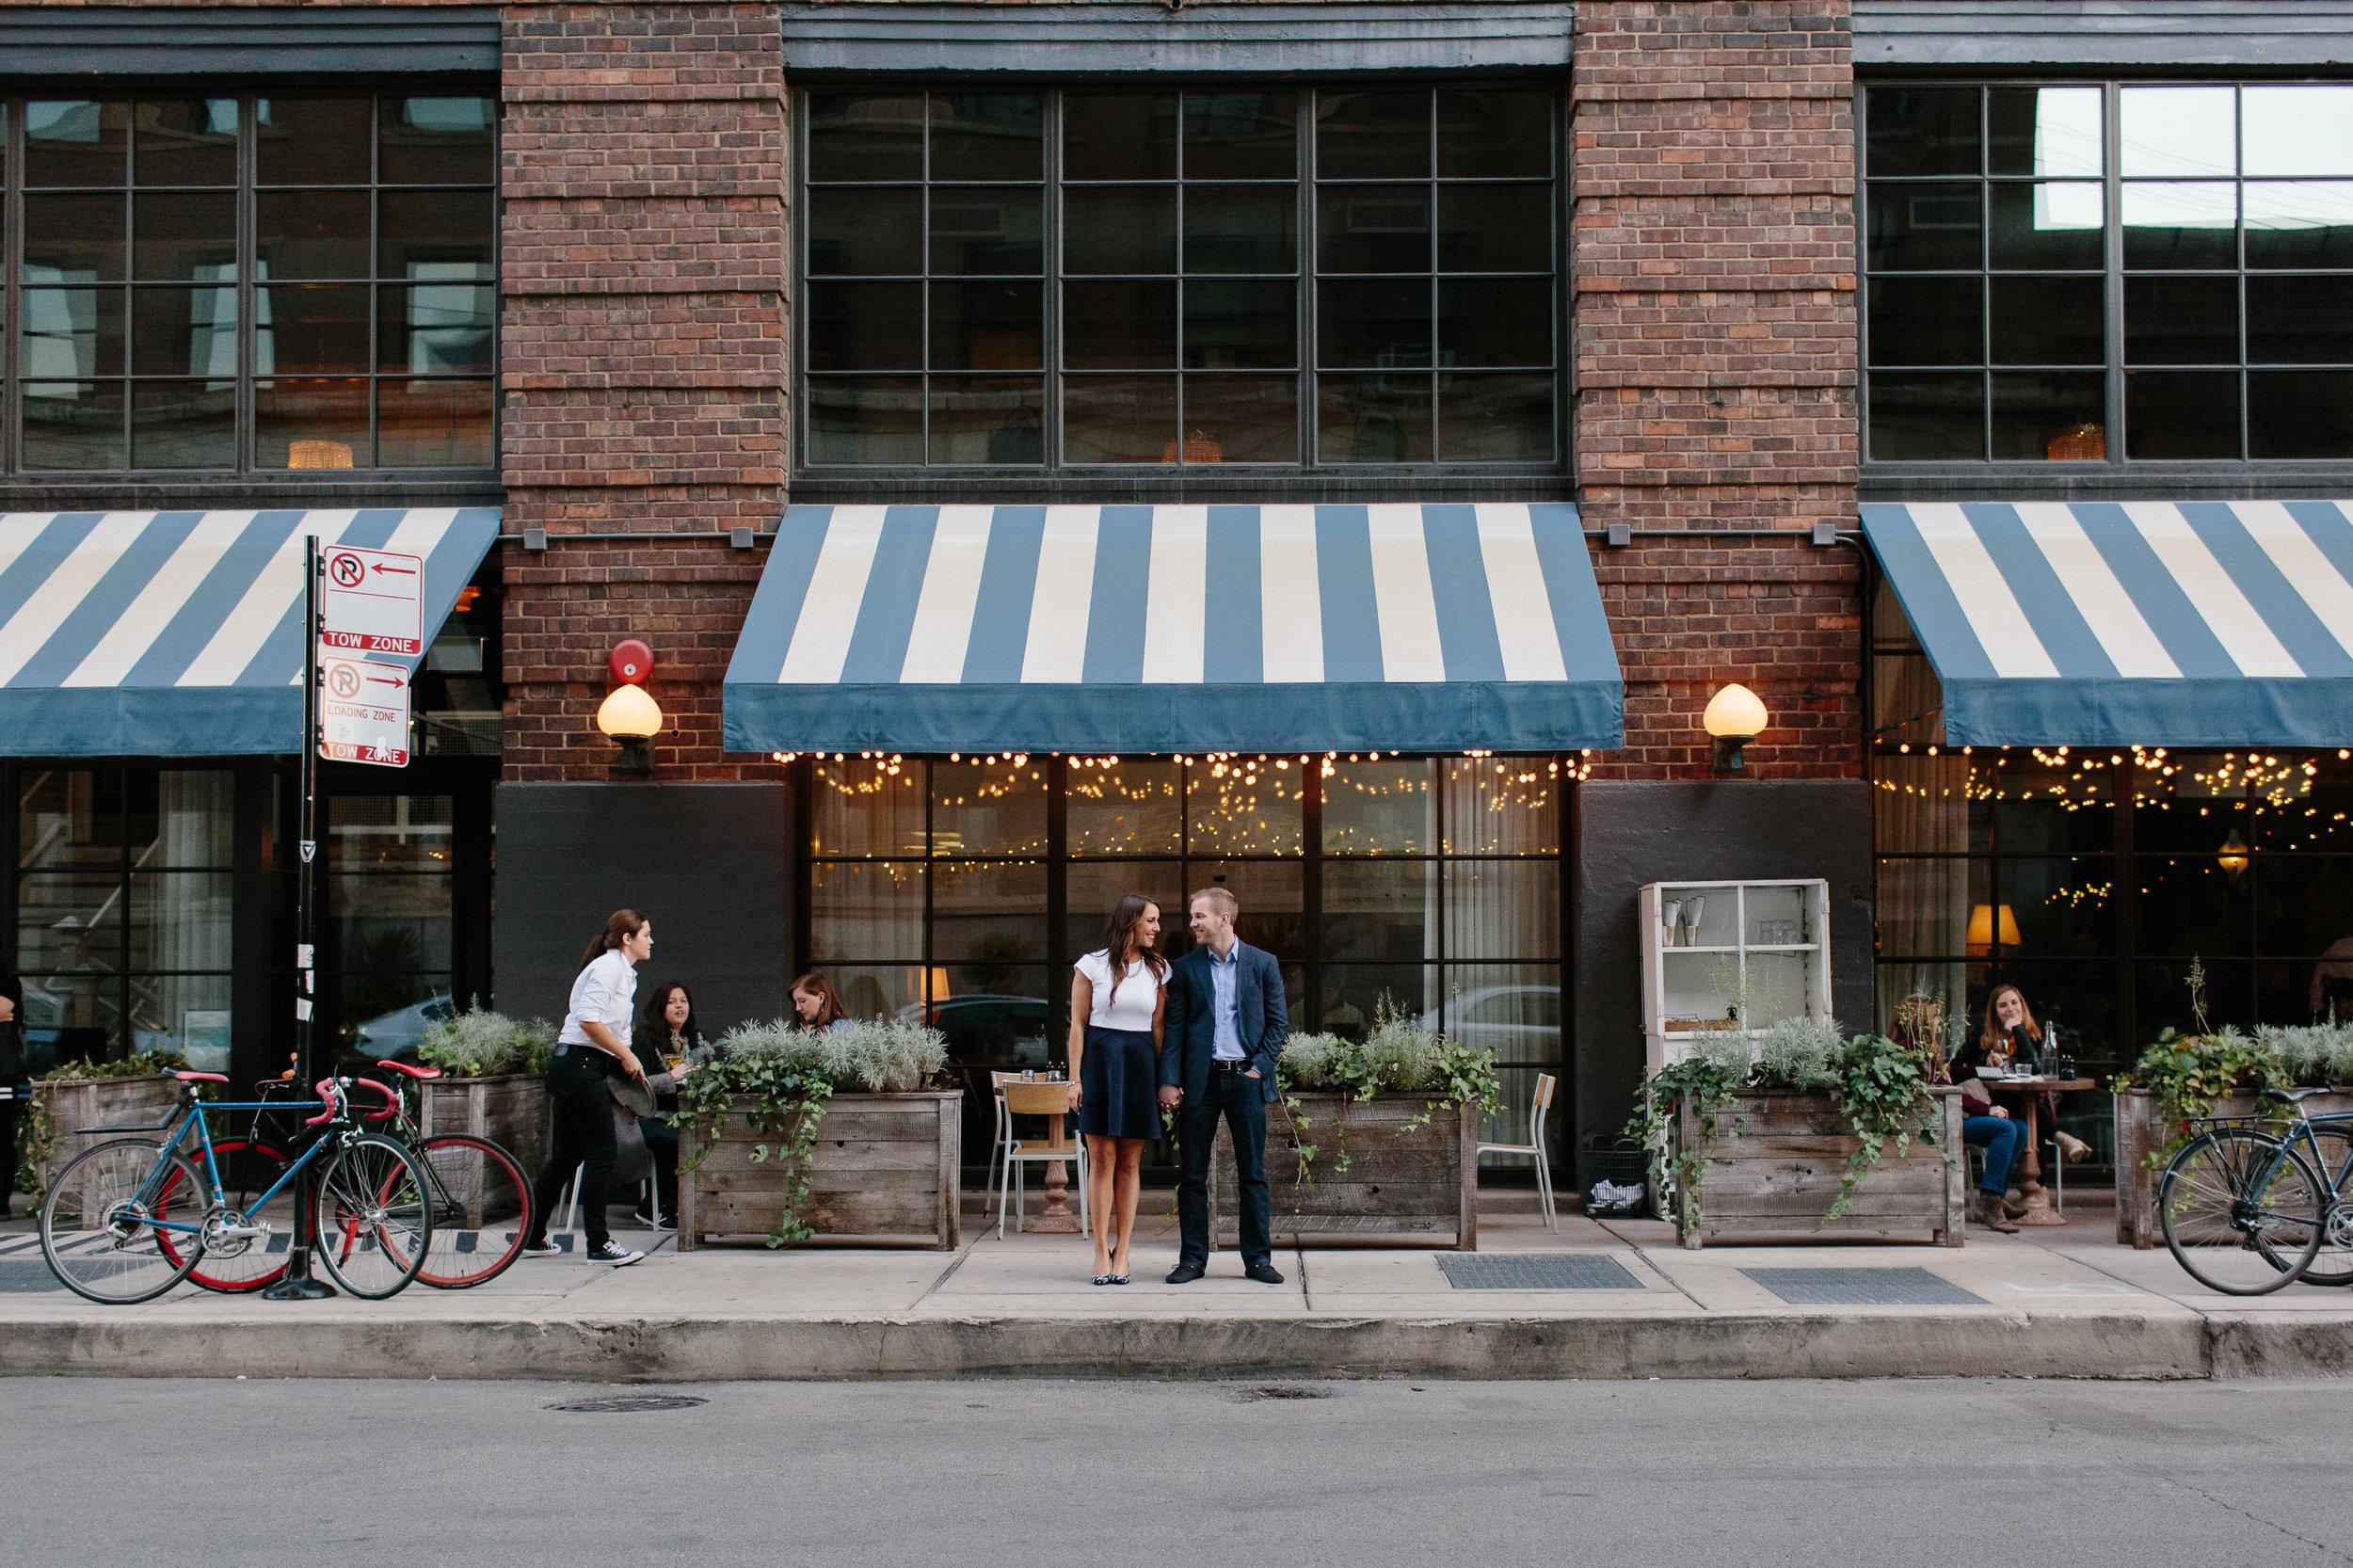 Nicodem Creative-Lotzer Engagement-West Loop Chicago-10.jpg